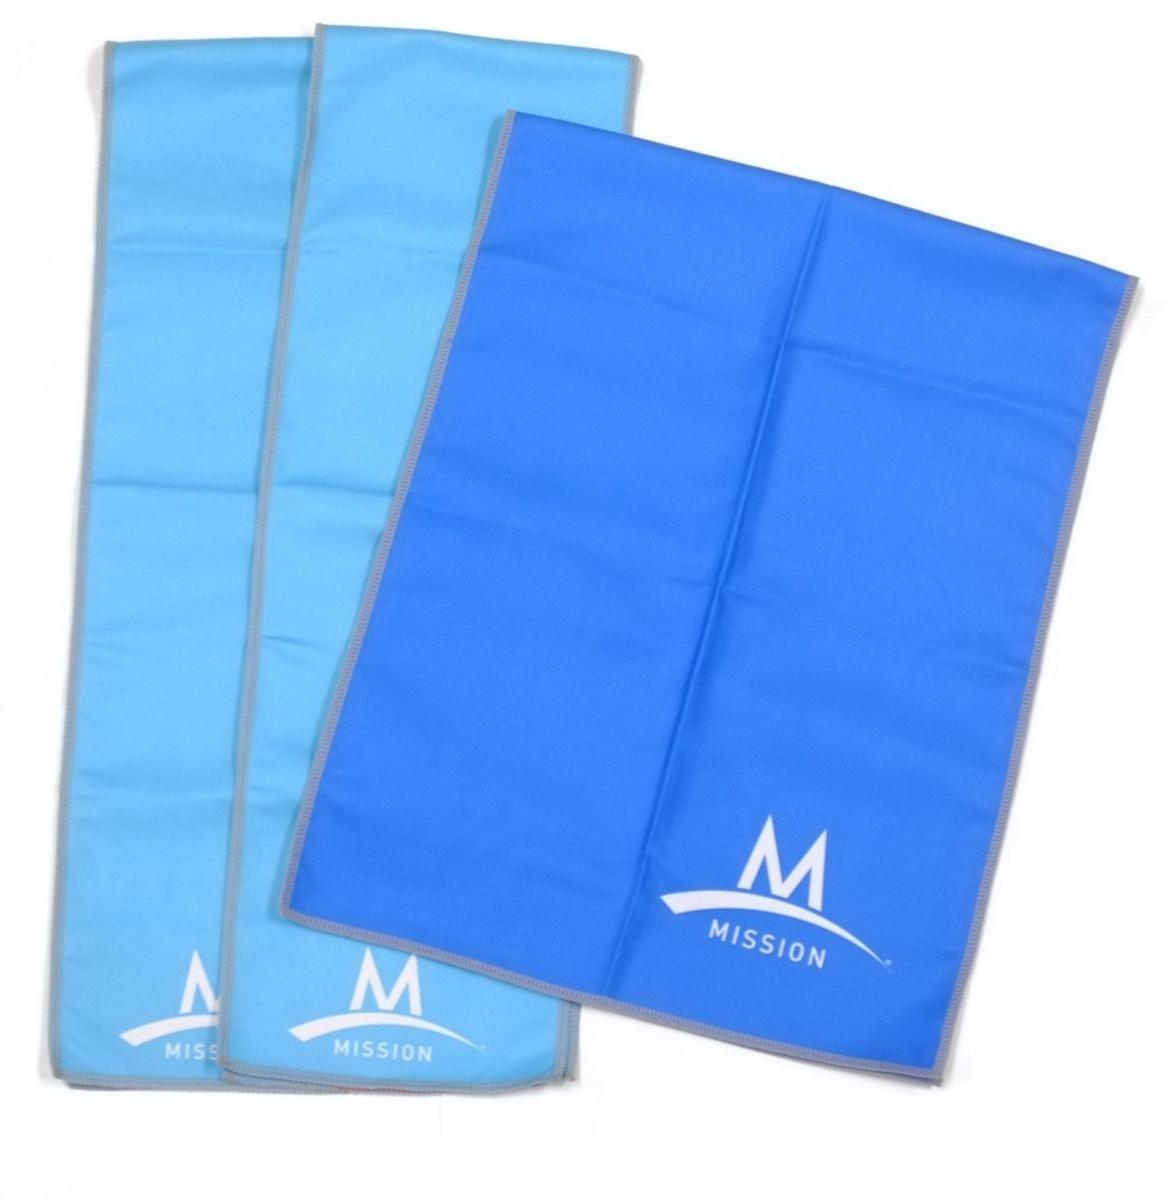 MISSION Enduracool Microfiber Cooling Towel 3 Piece Set (1 Large Towel & 2 Wraps)